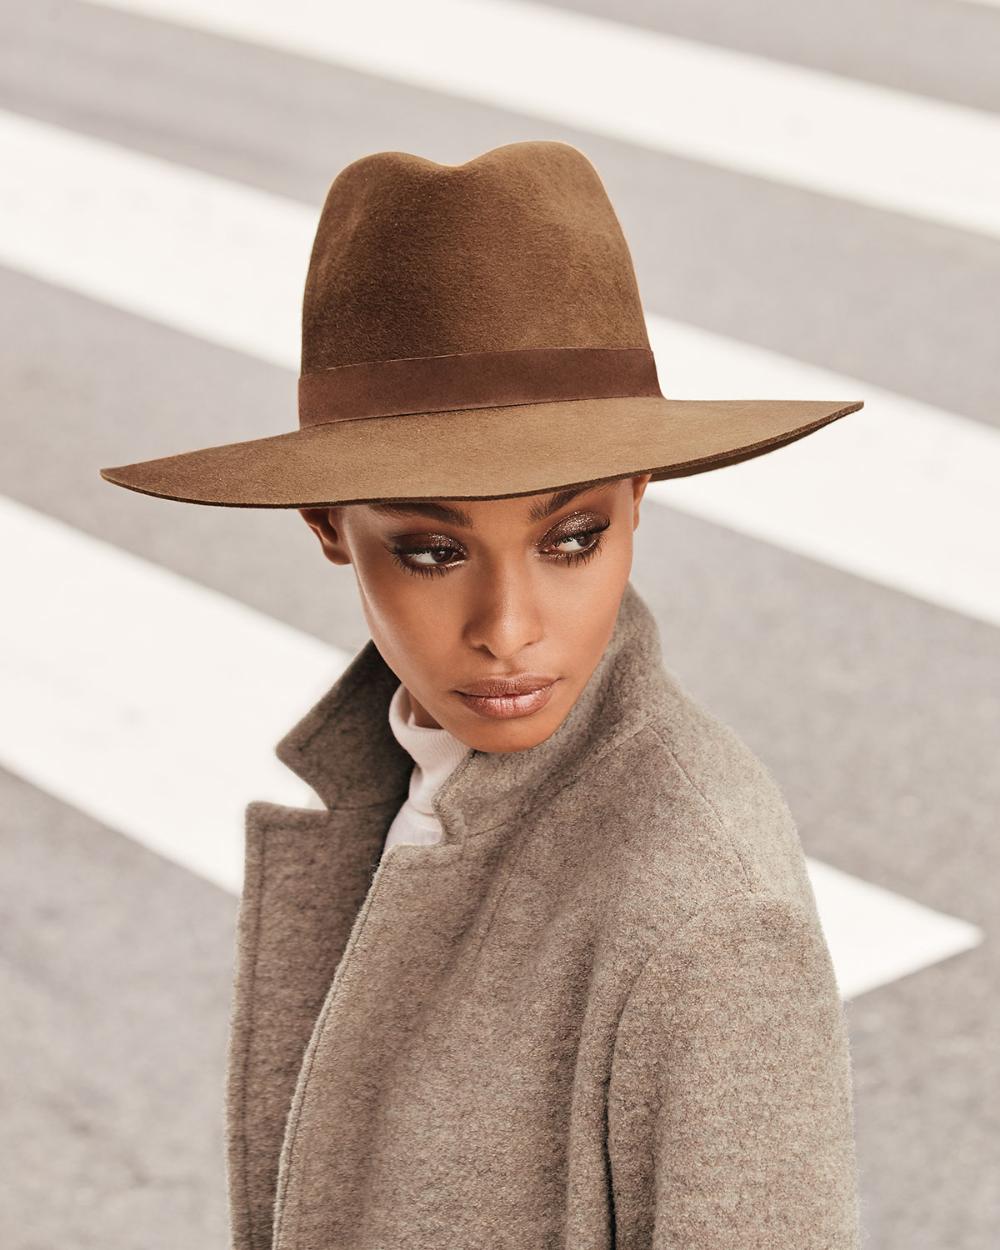 Janessa Leone Harper Wool Fedora Hat Fedora Hat Outfits Fedora Hat Outfit Fall Wool Fedora Hat